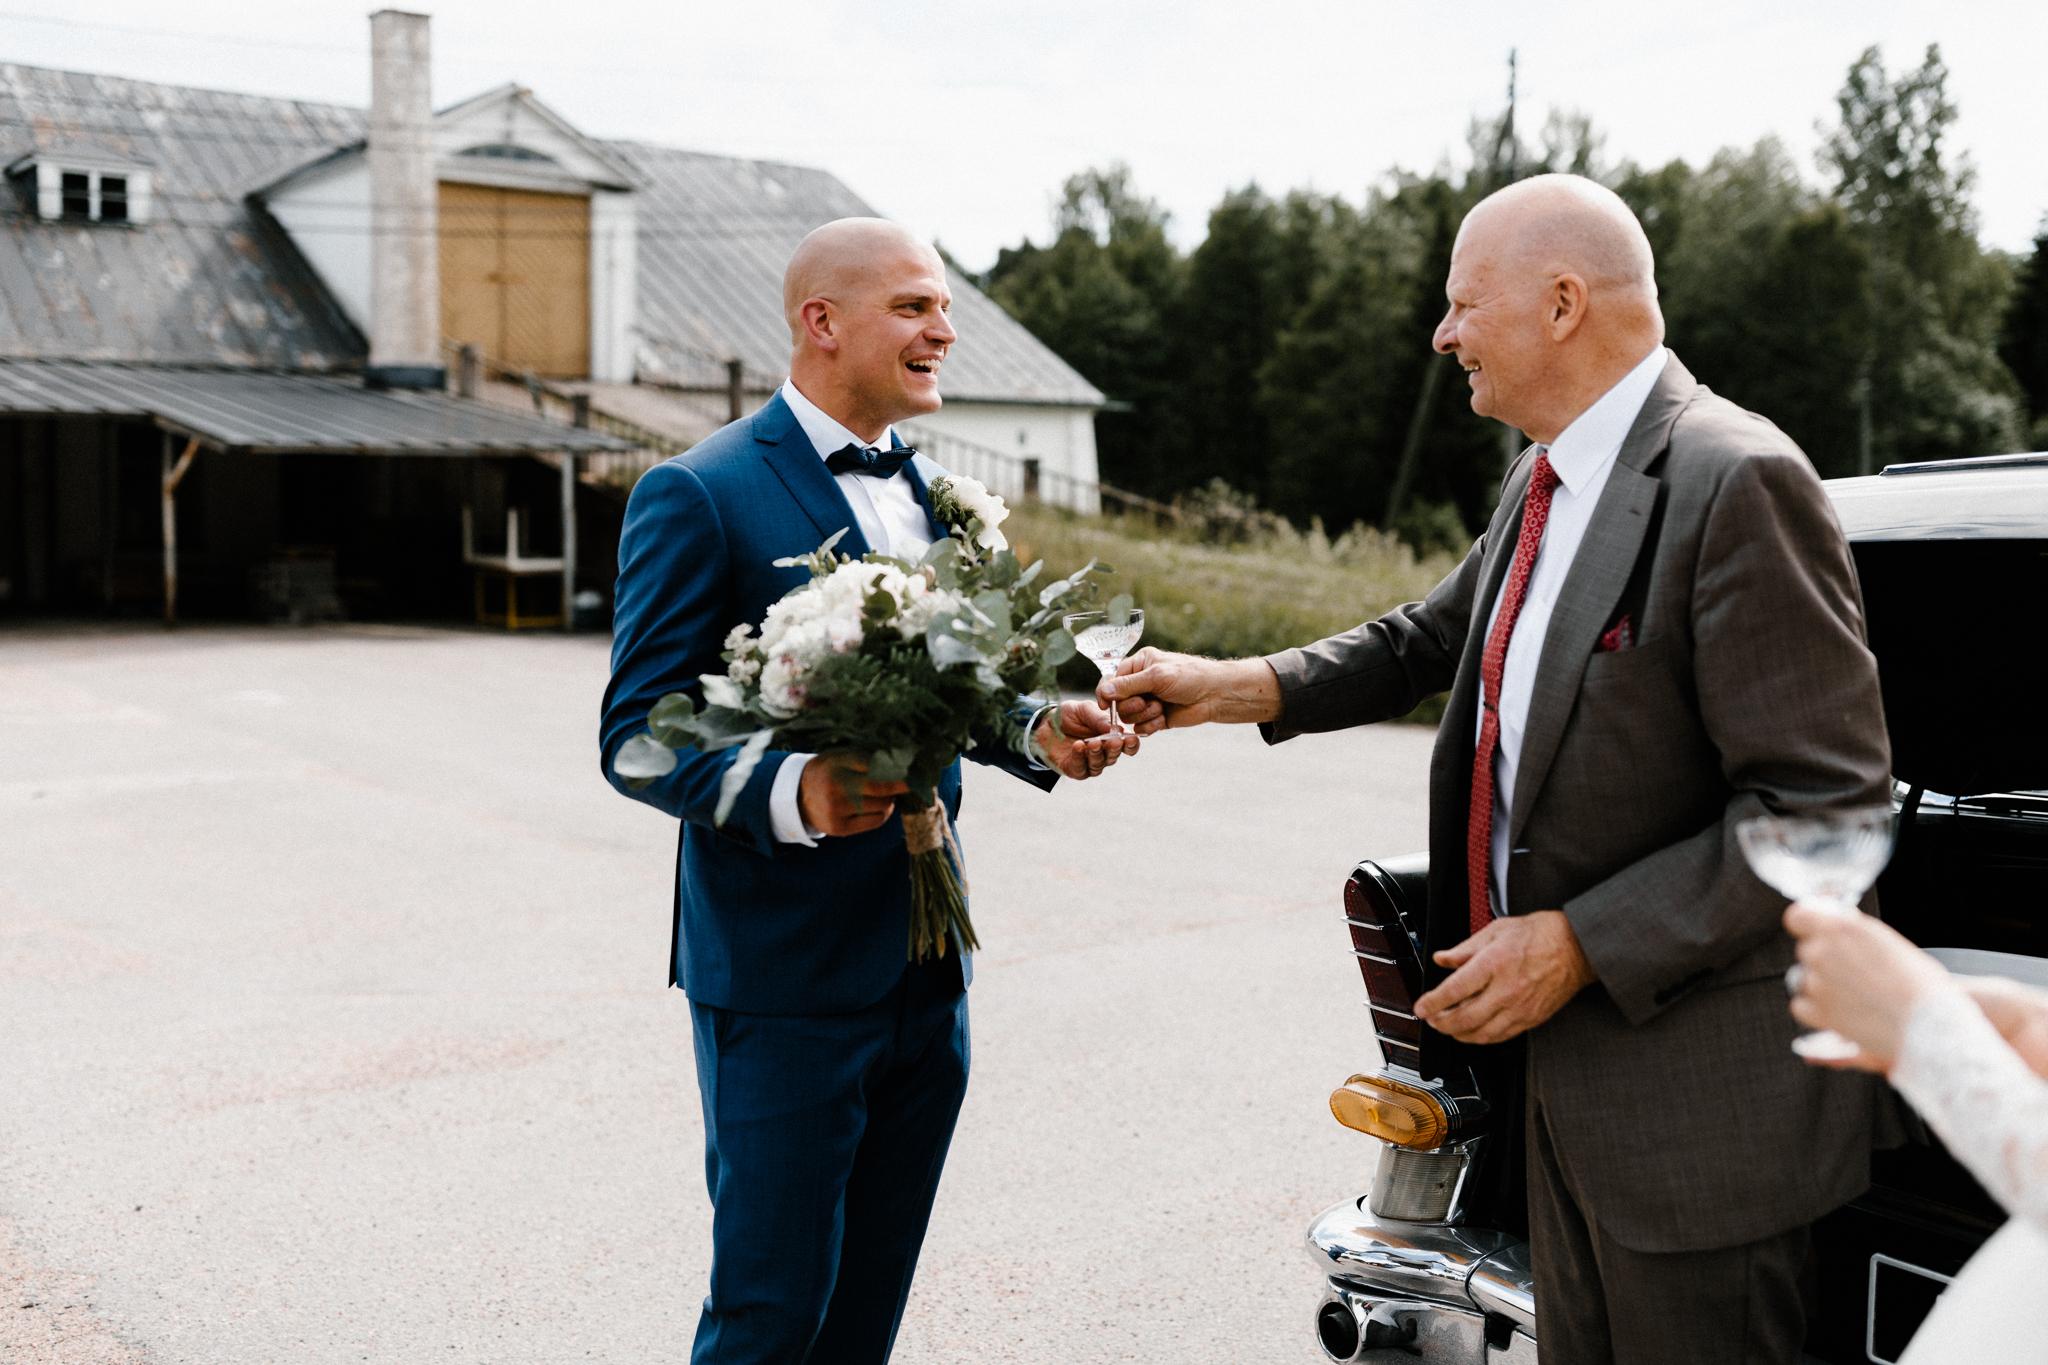 Essi + Ville   Oitbacka Gården   by Patrick Karkkolainen Wedding Photography-174.jpg